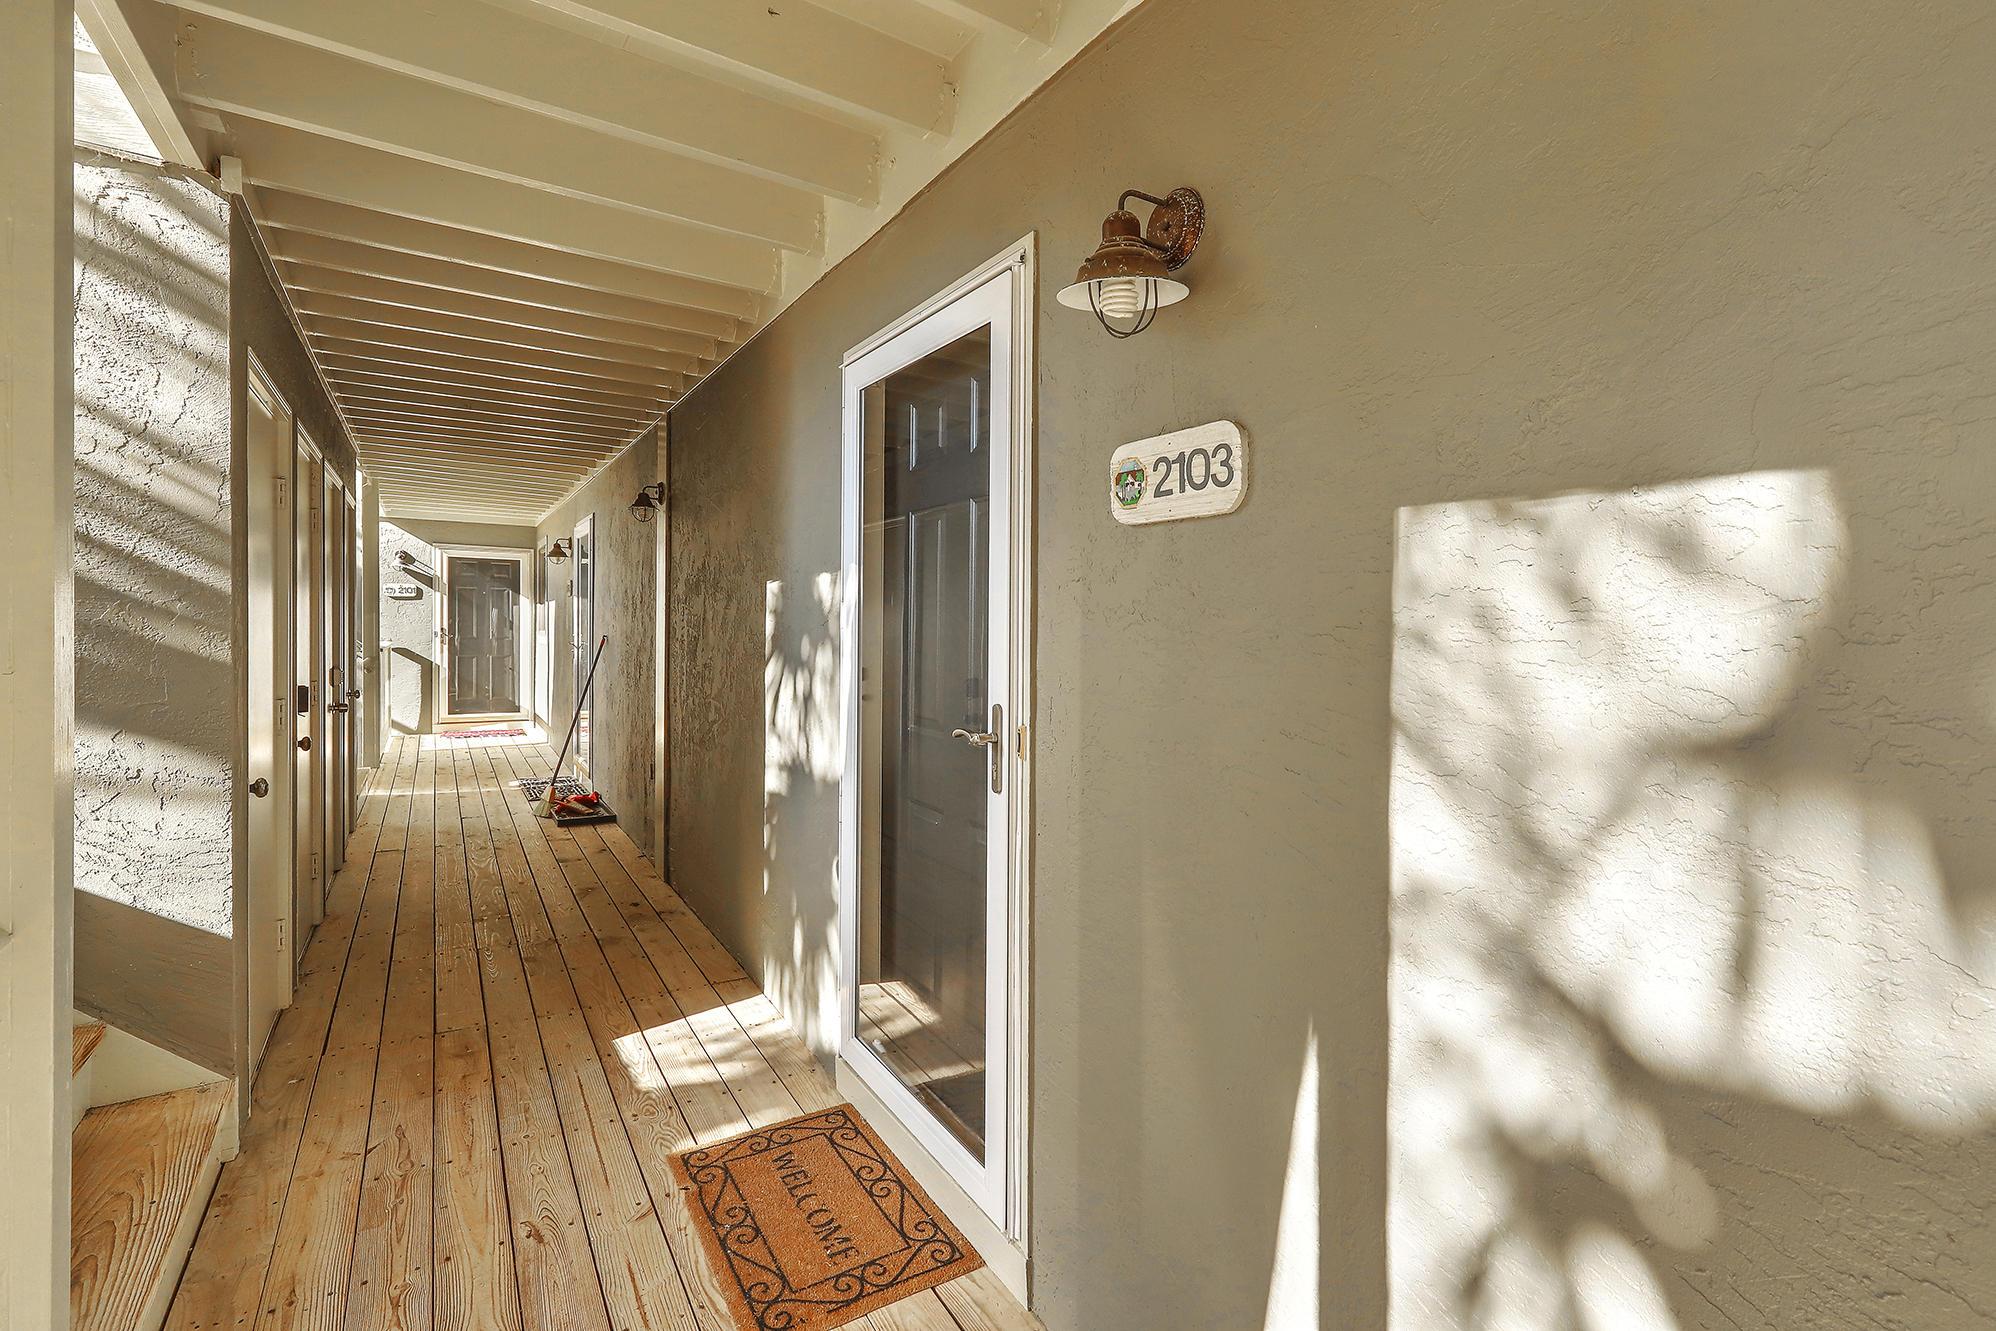 Seabrook Island Homes For Sale - 2103 Landfall, Johns Island, SC - 22